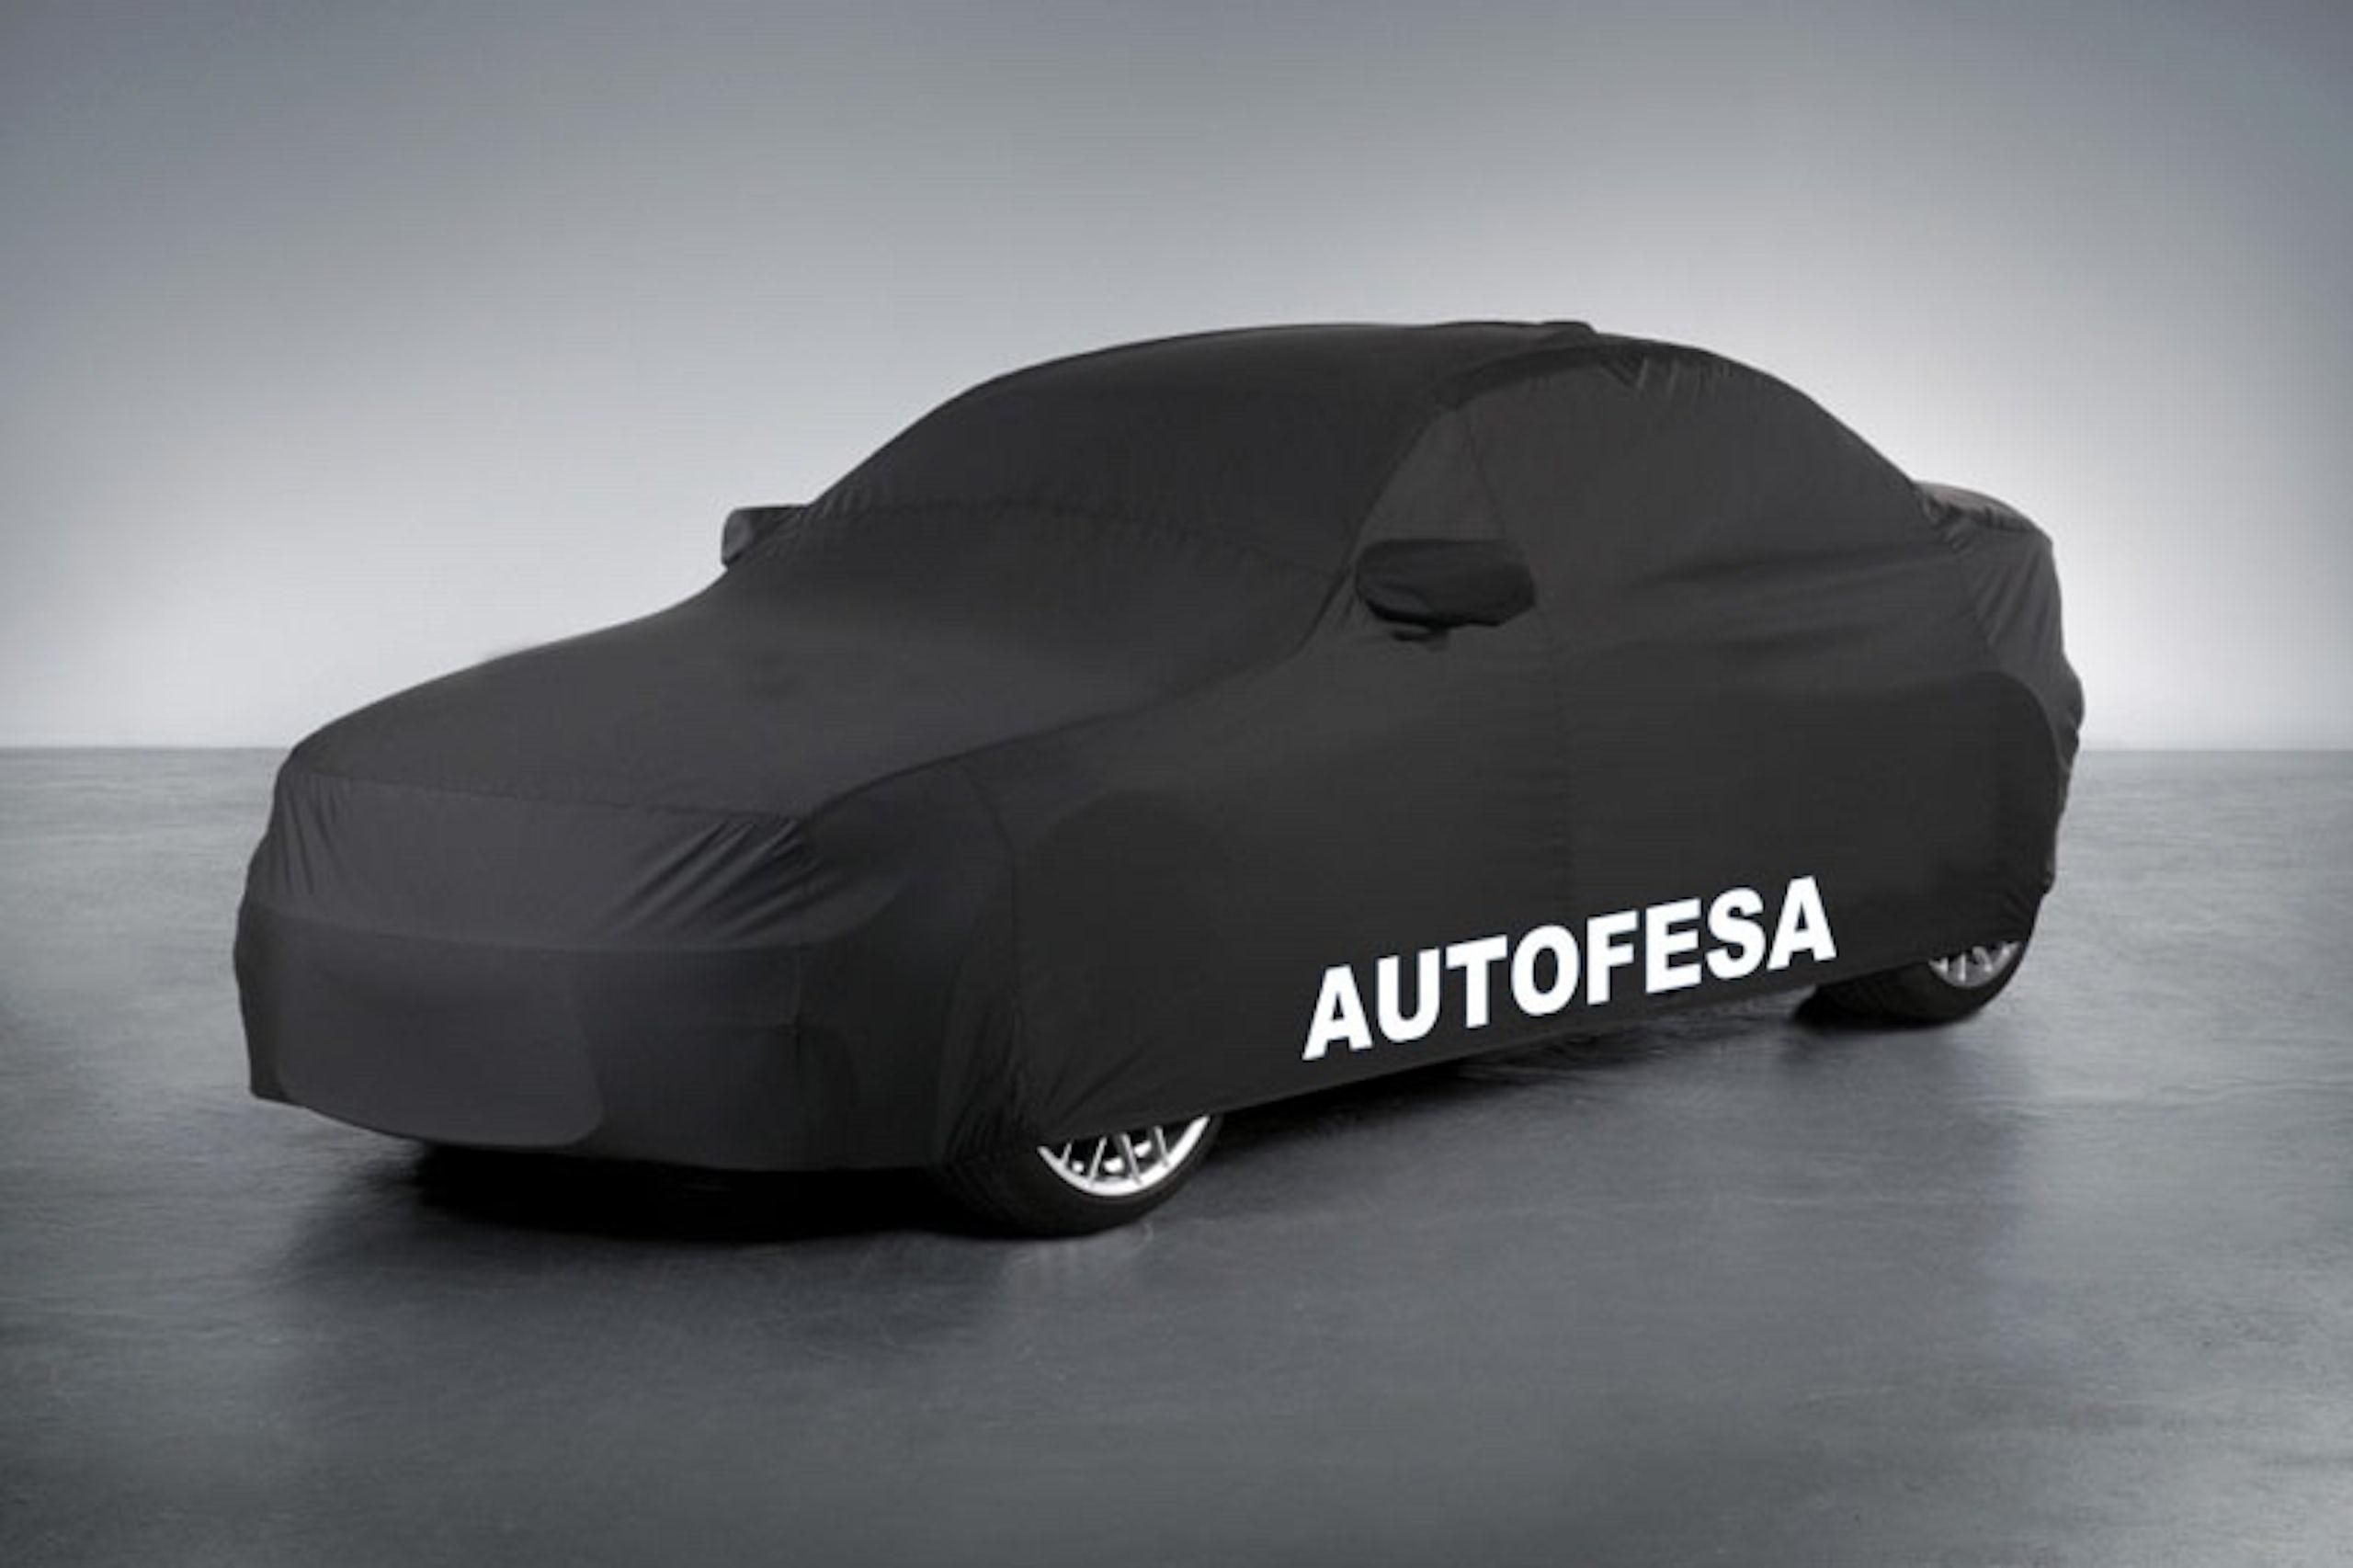 Audi Q5 2.0 TDI 170cv quattro 5p S tronic Auto - Foto 10